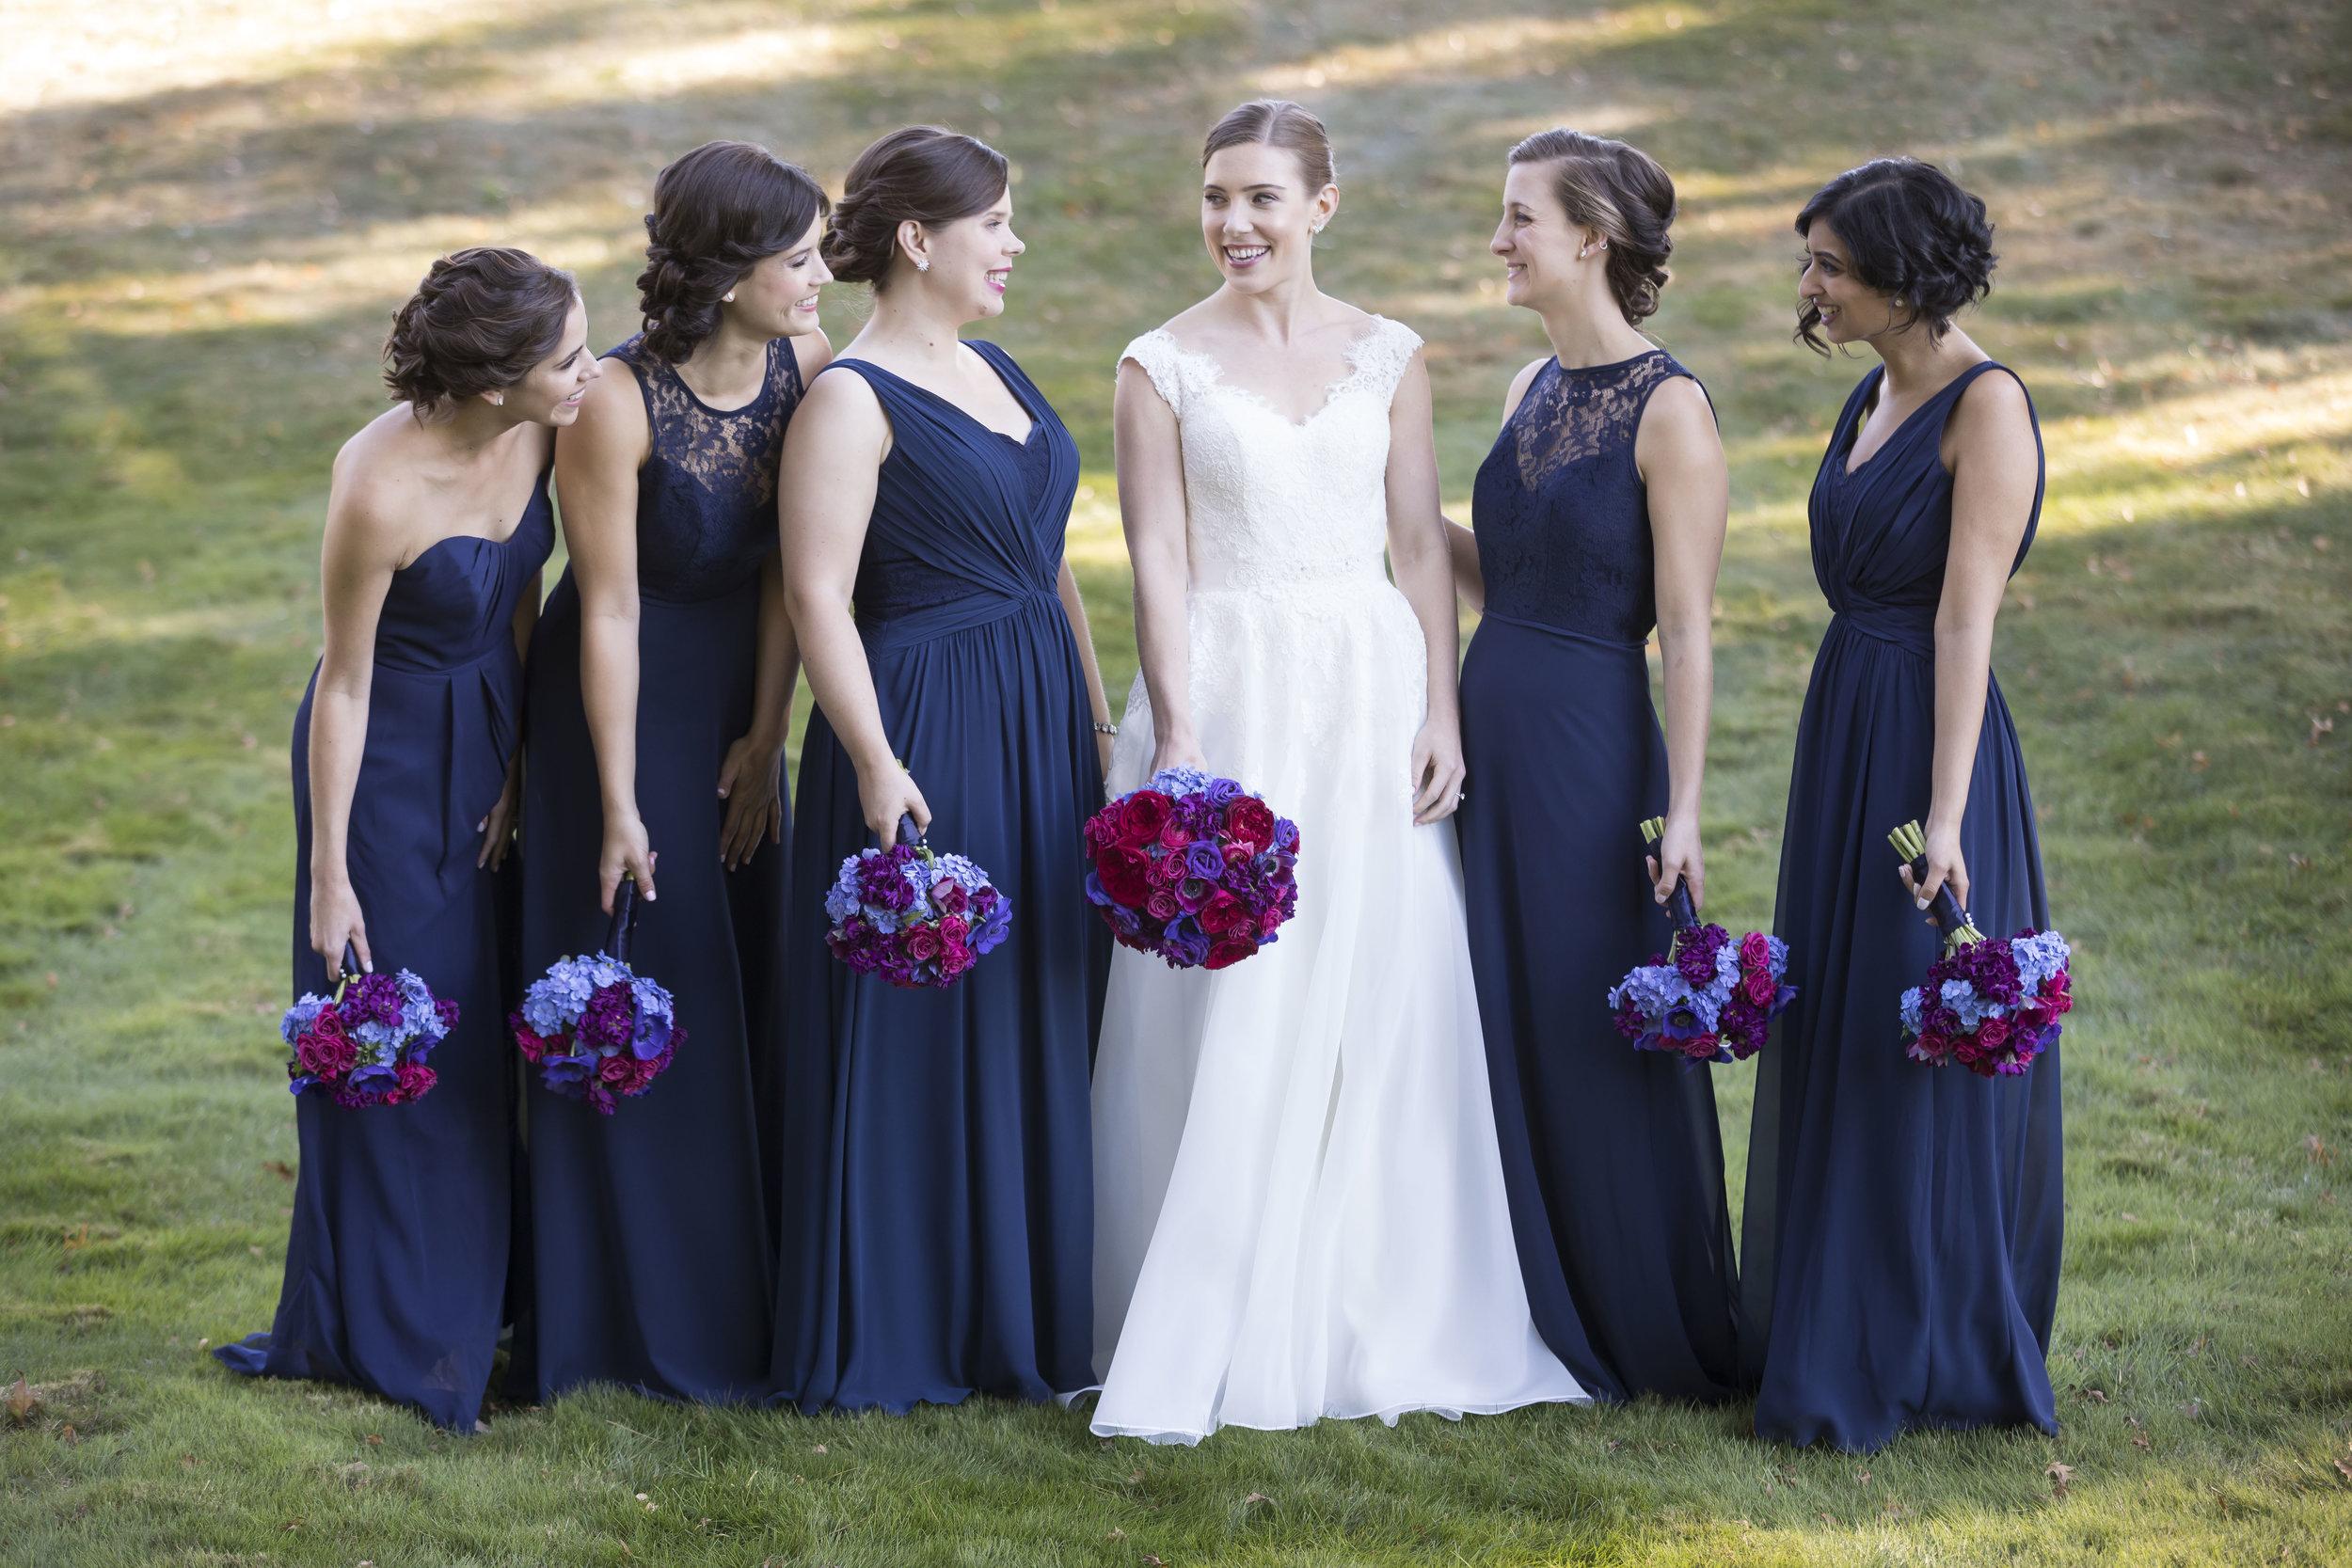 Tappan-Hill-Wedding-Photographer-0032.JPG